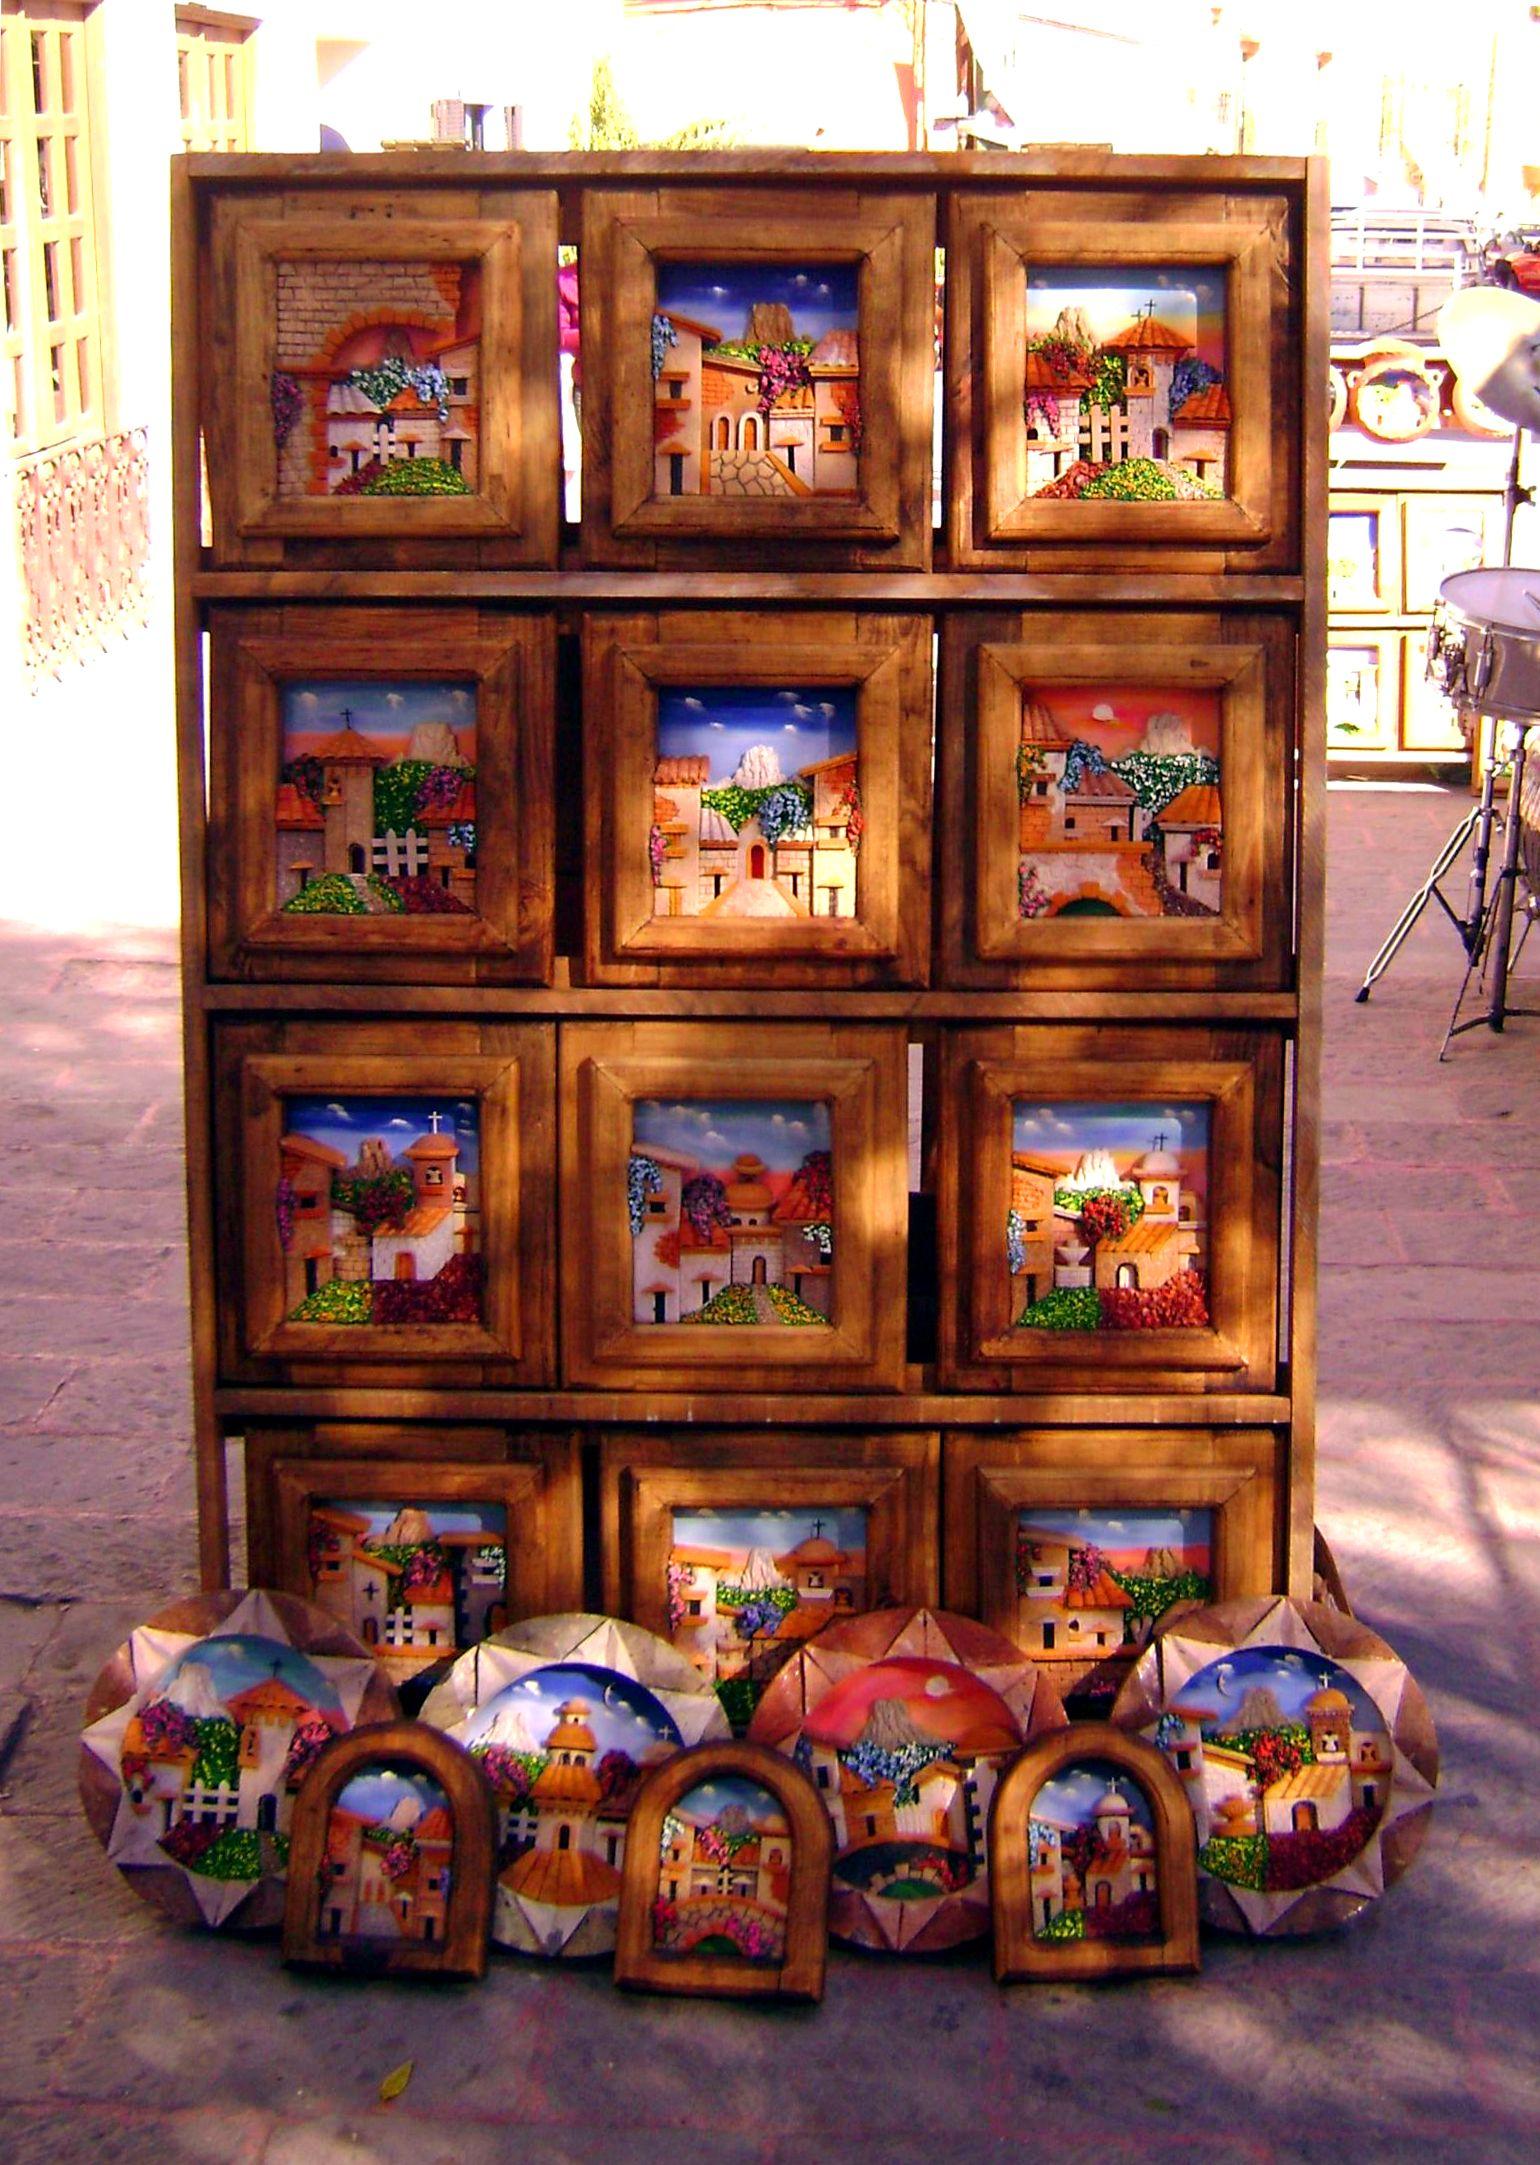 Pin De Liz Ayala Quirarte En Mexico Colors And Textures